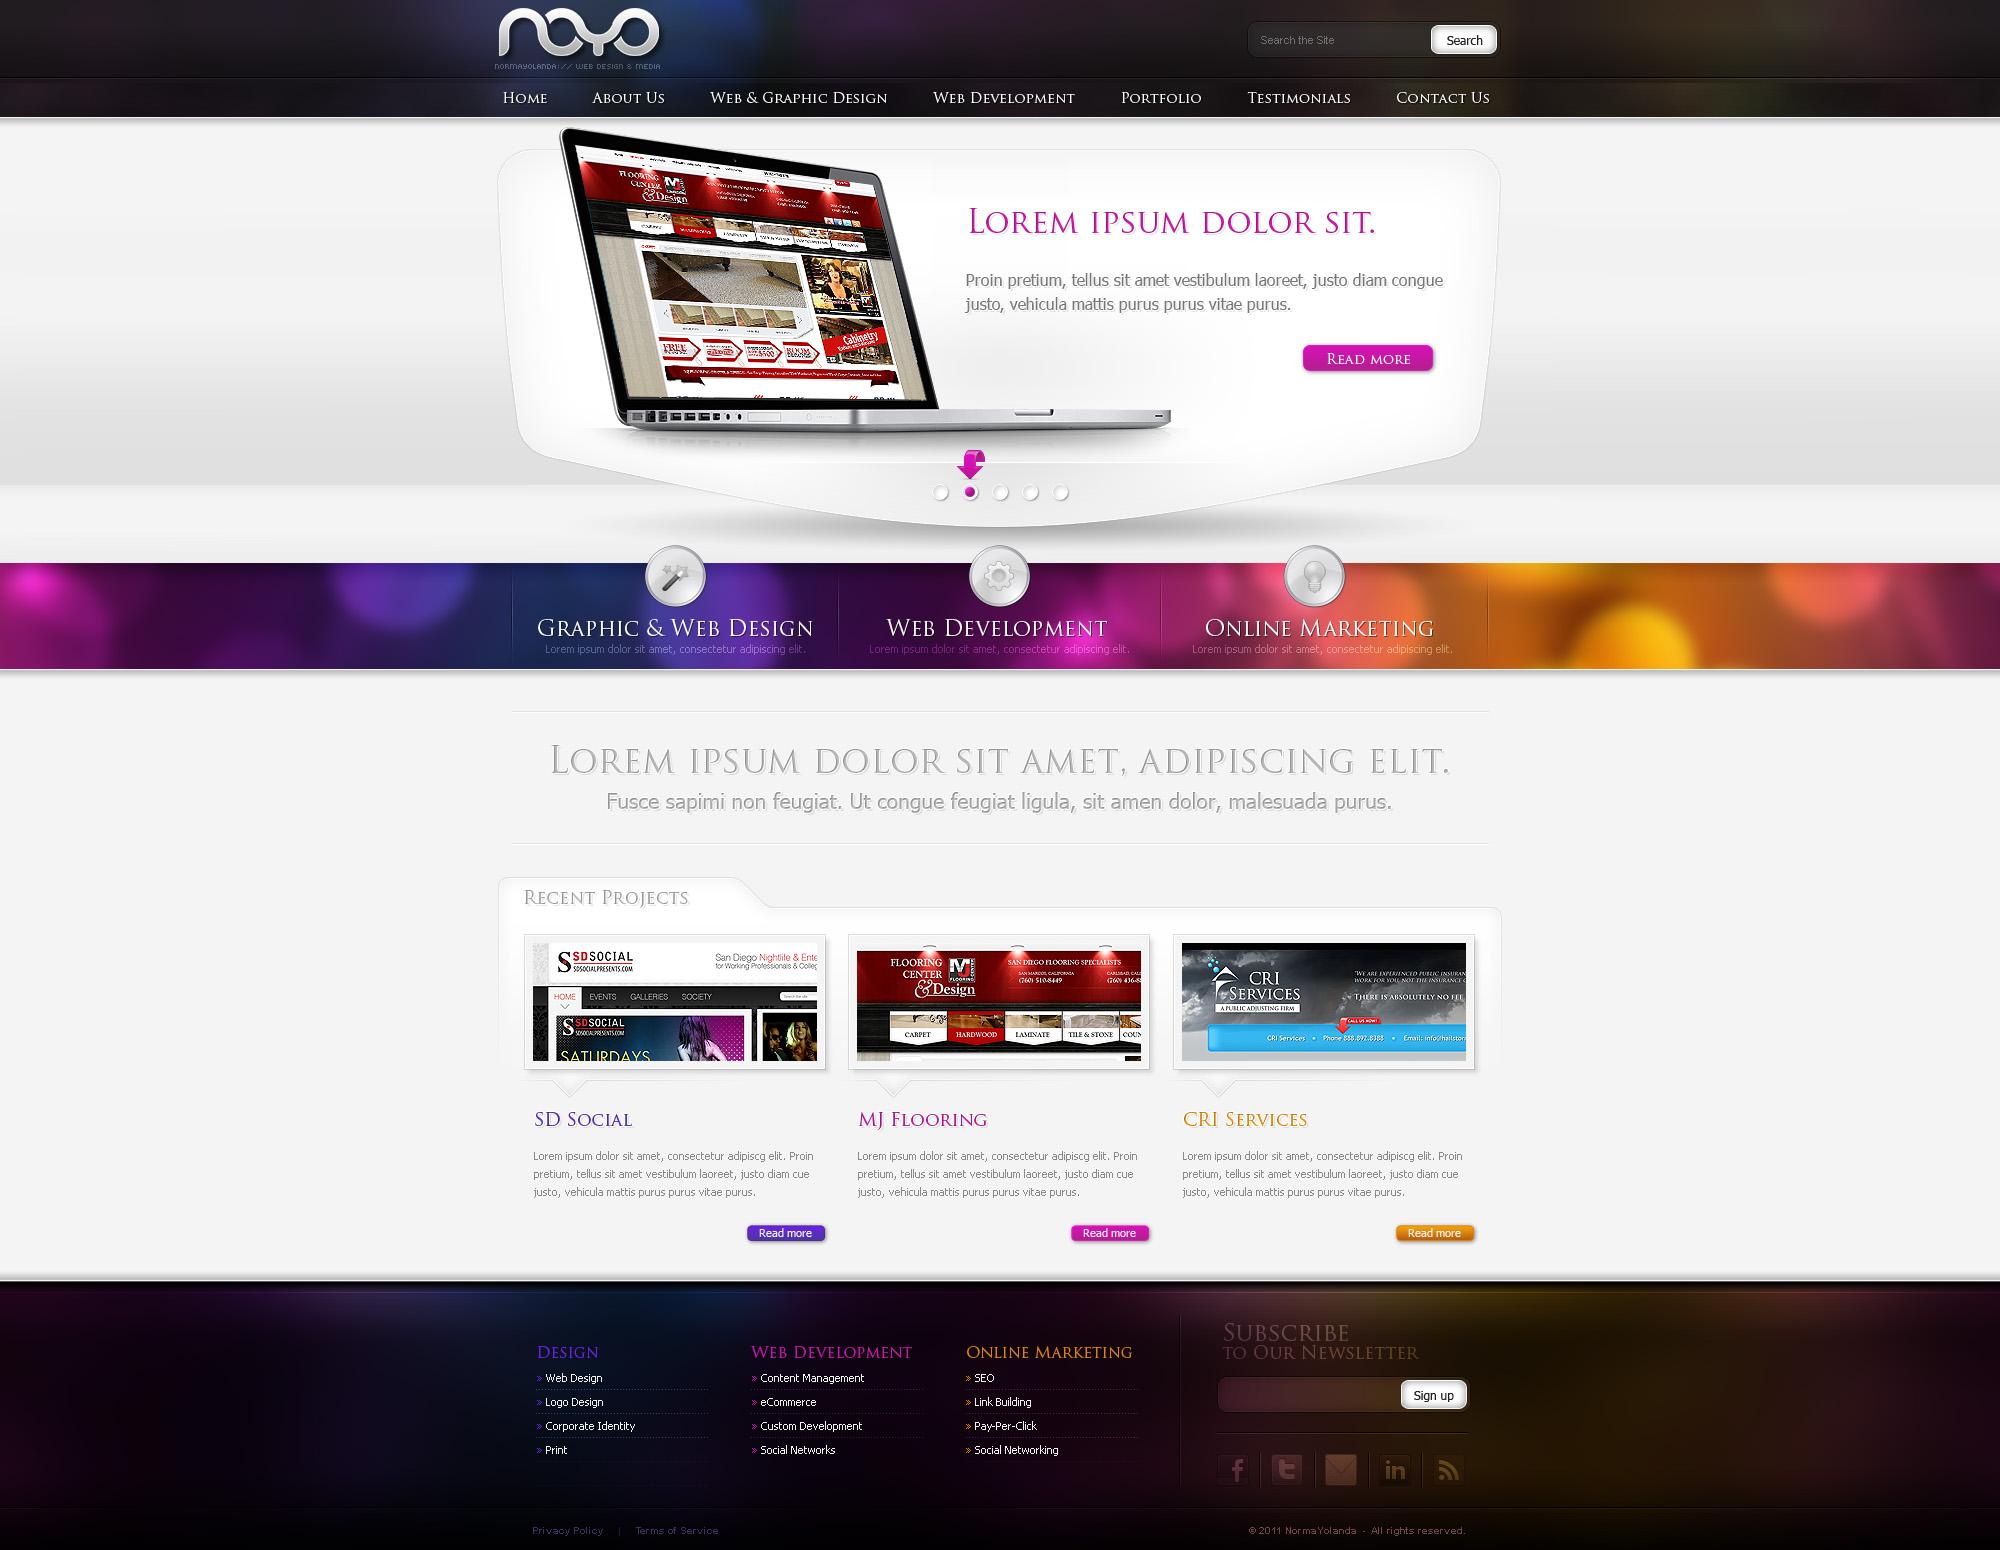 Web design: NOYO webdesign by VictoryDesign